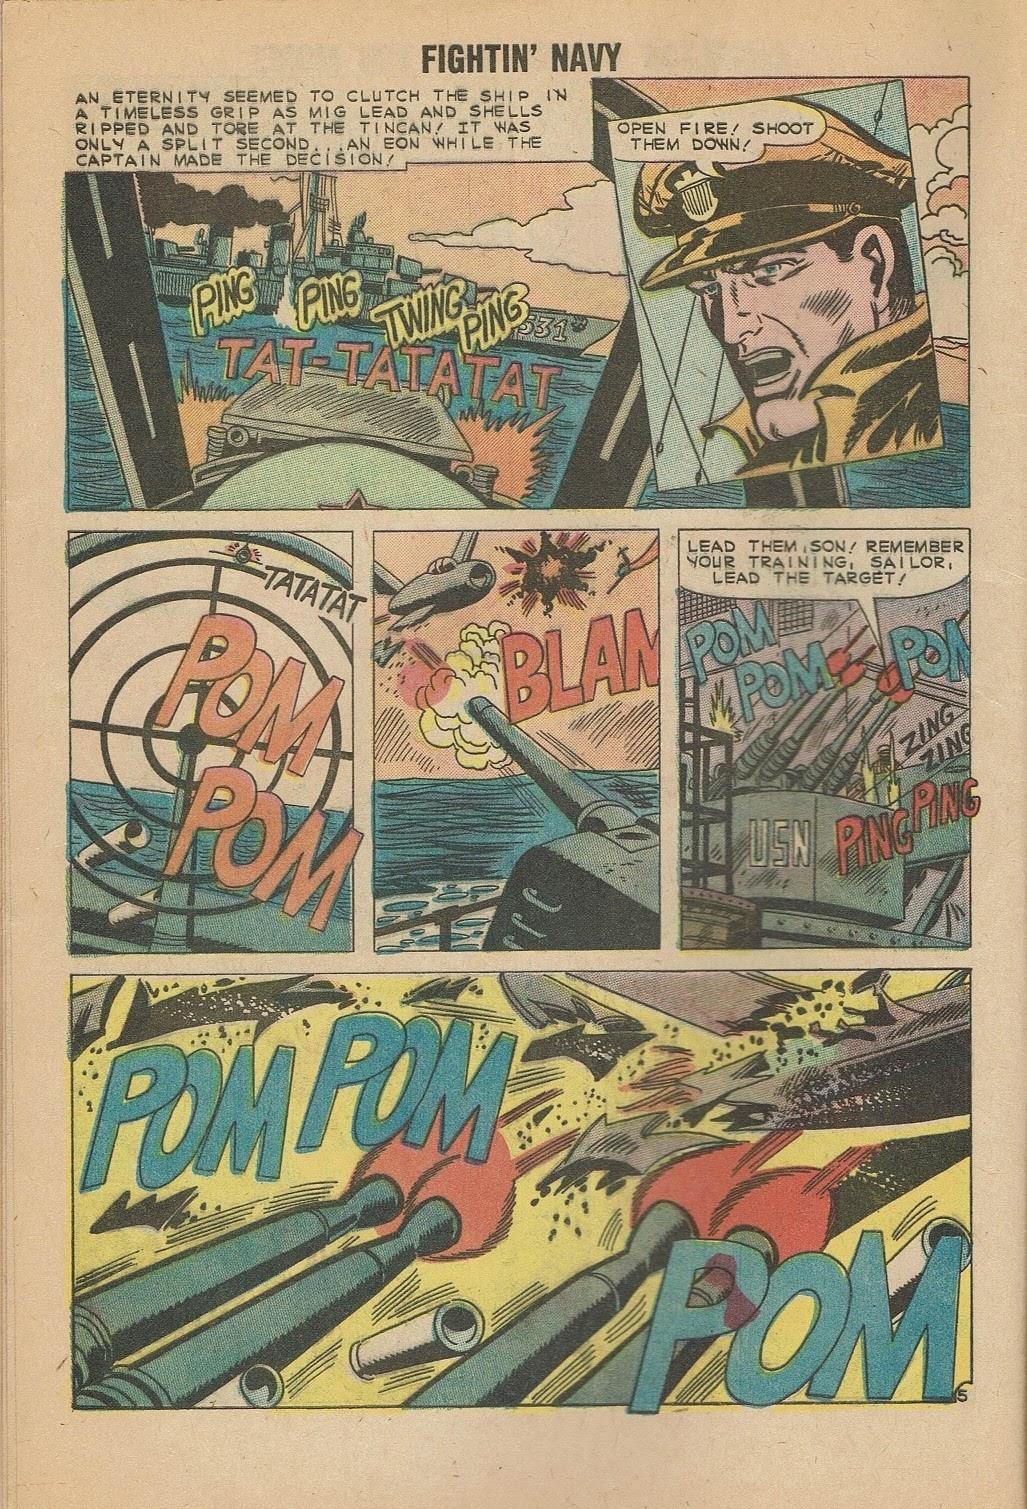 Read online Fightin' Navy comic -  Issue #95 - 8